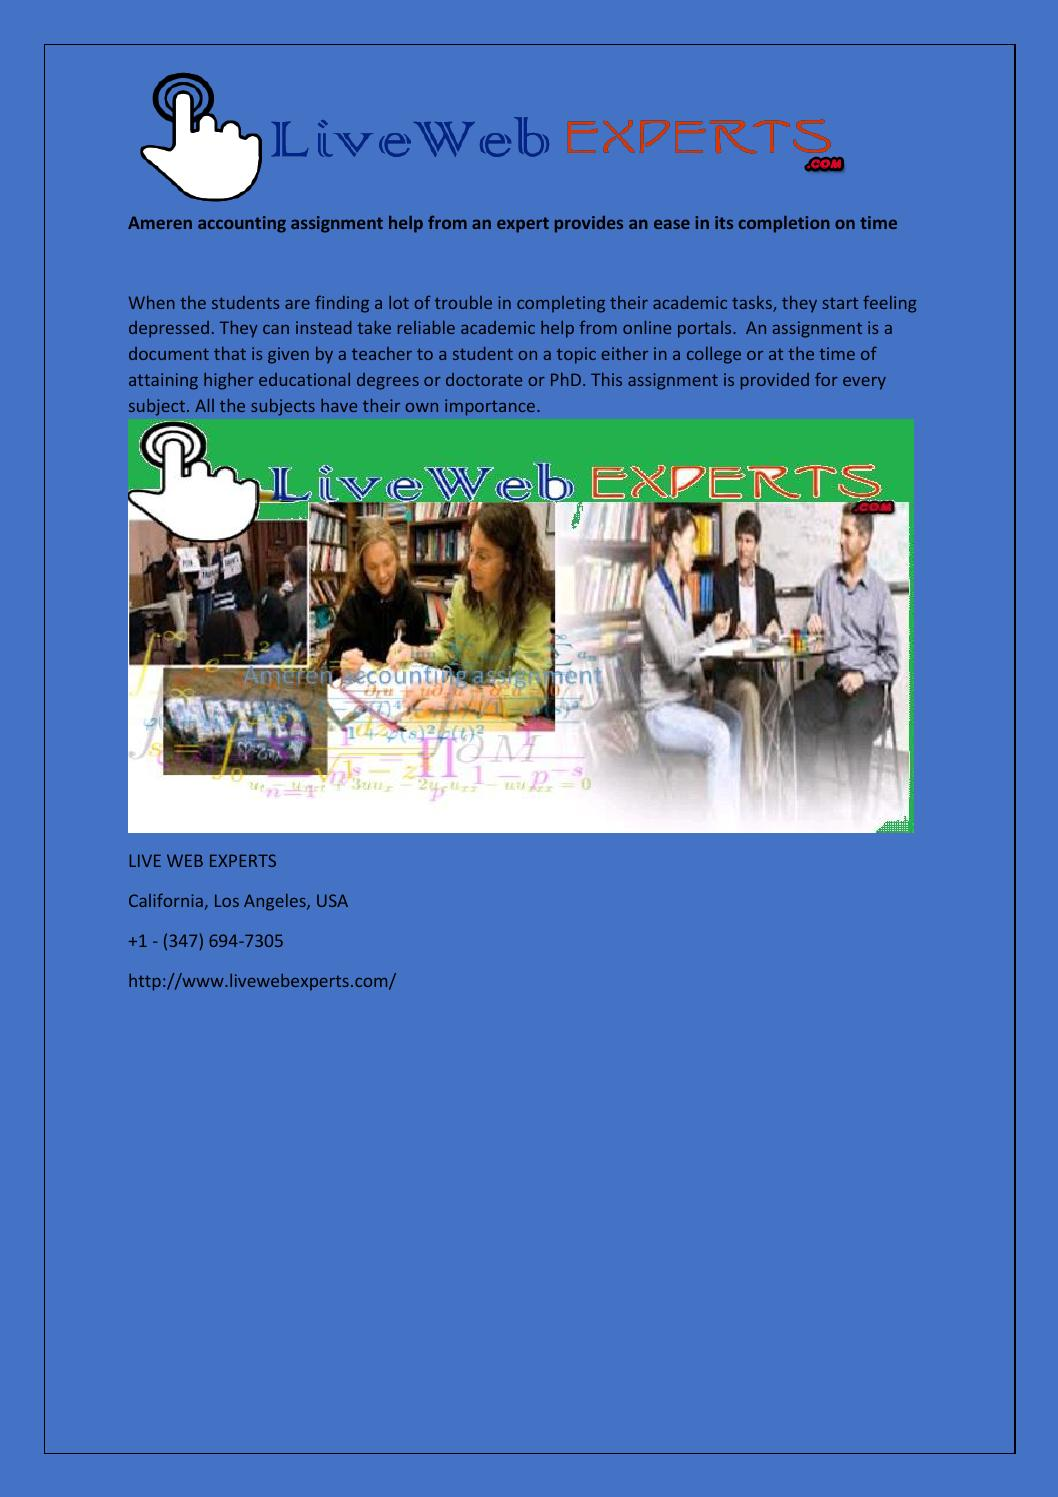 Ameren accounting assignment - blogger.com